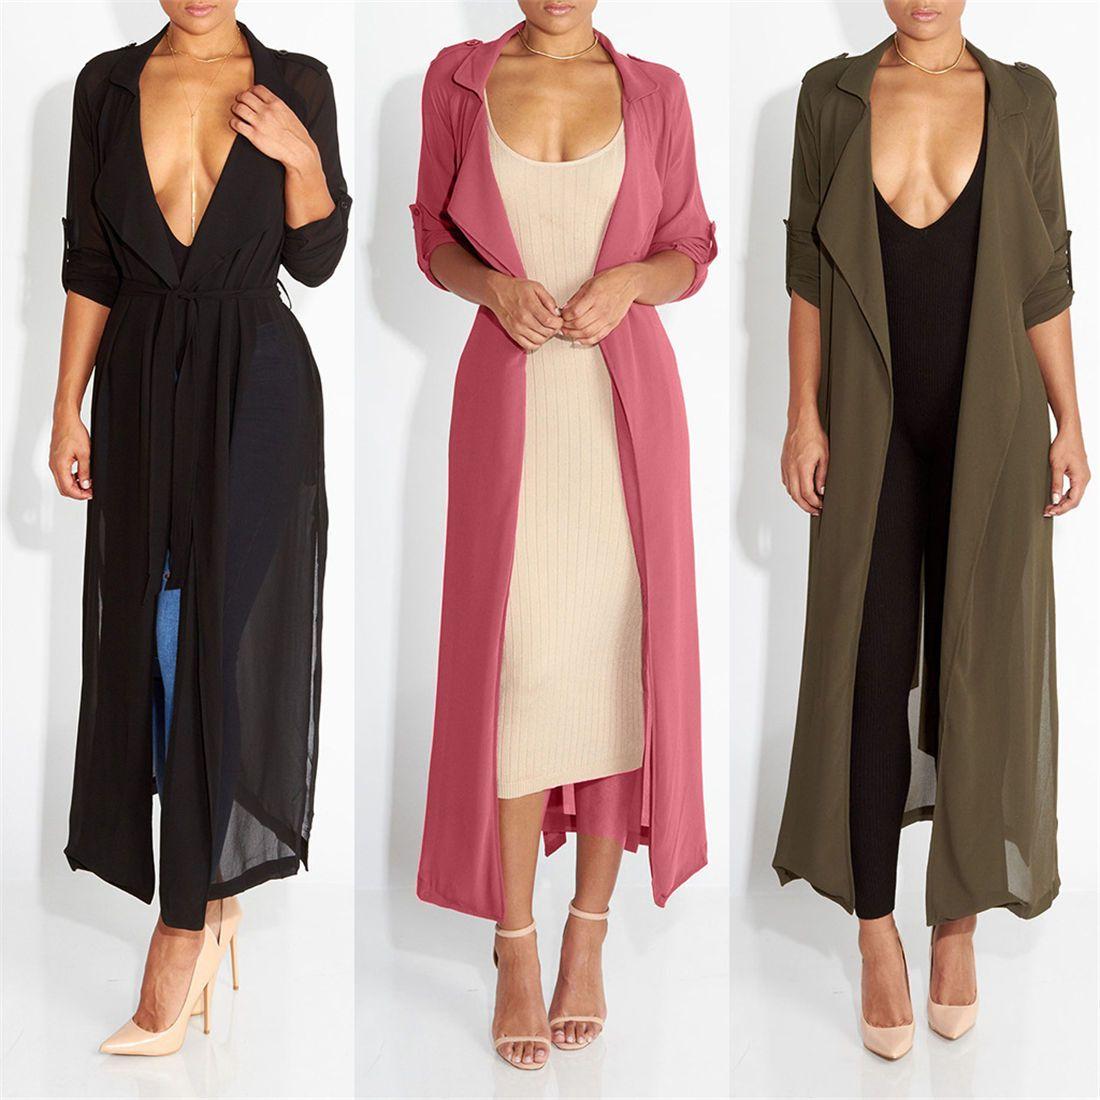 cf32ab1b9f Elegant Women Kimono Jacket Long Sleeve Maxi Cardigan Chiffon Coat Top  Blouse